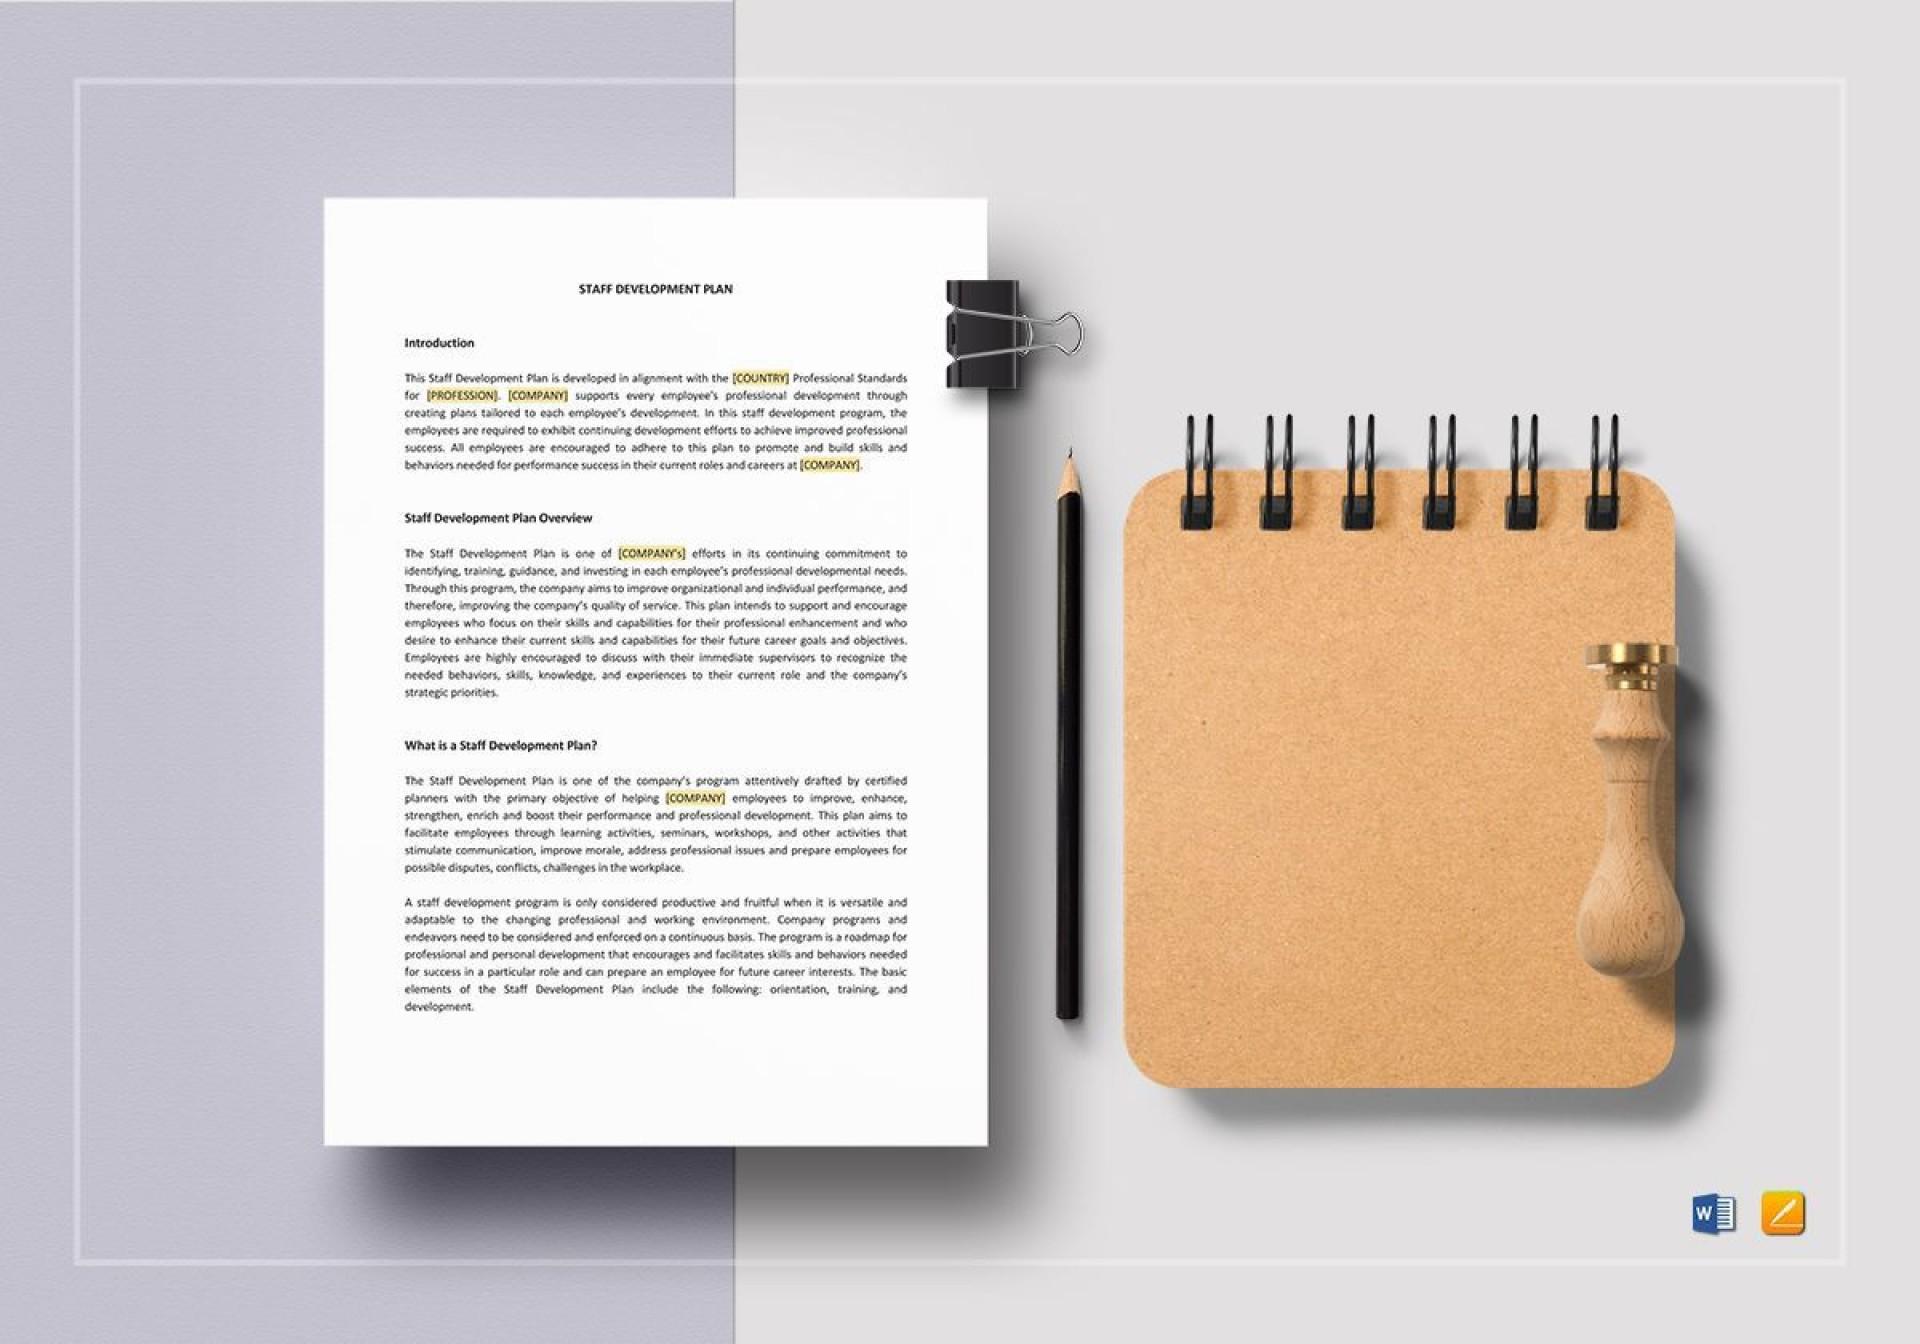 008 Unusual Professional Development Plan Template For Employee Idea  Example Sample1920